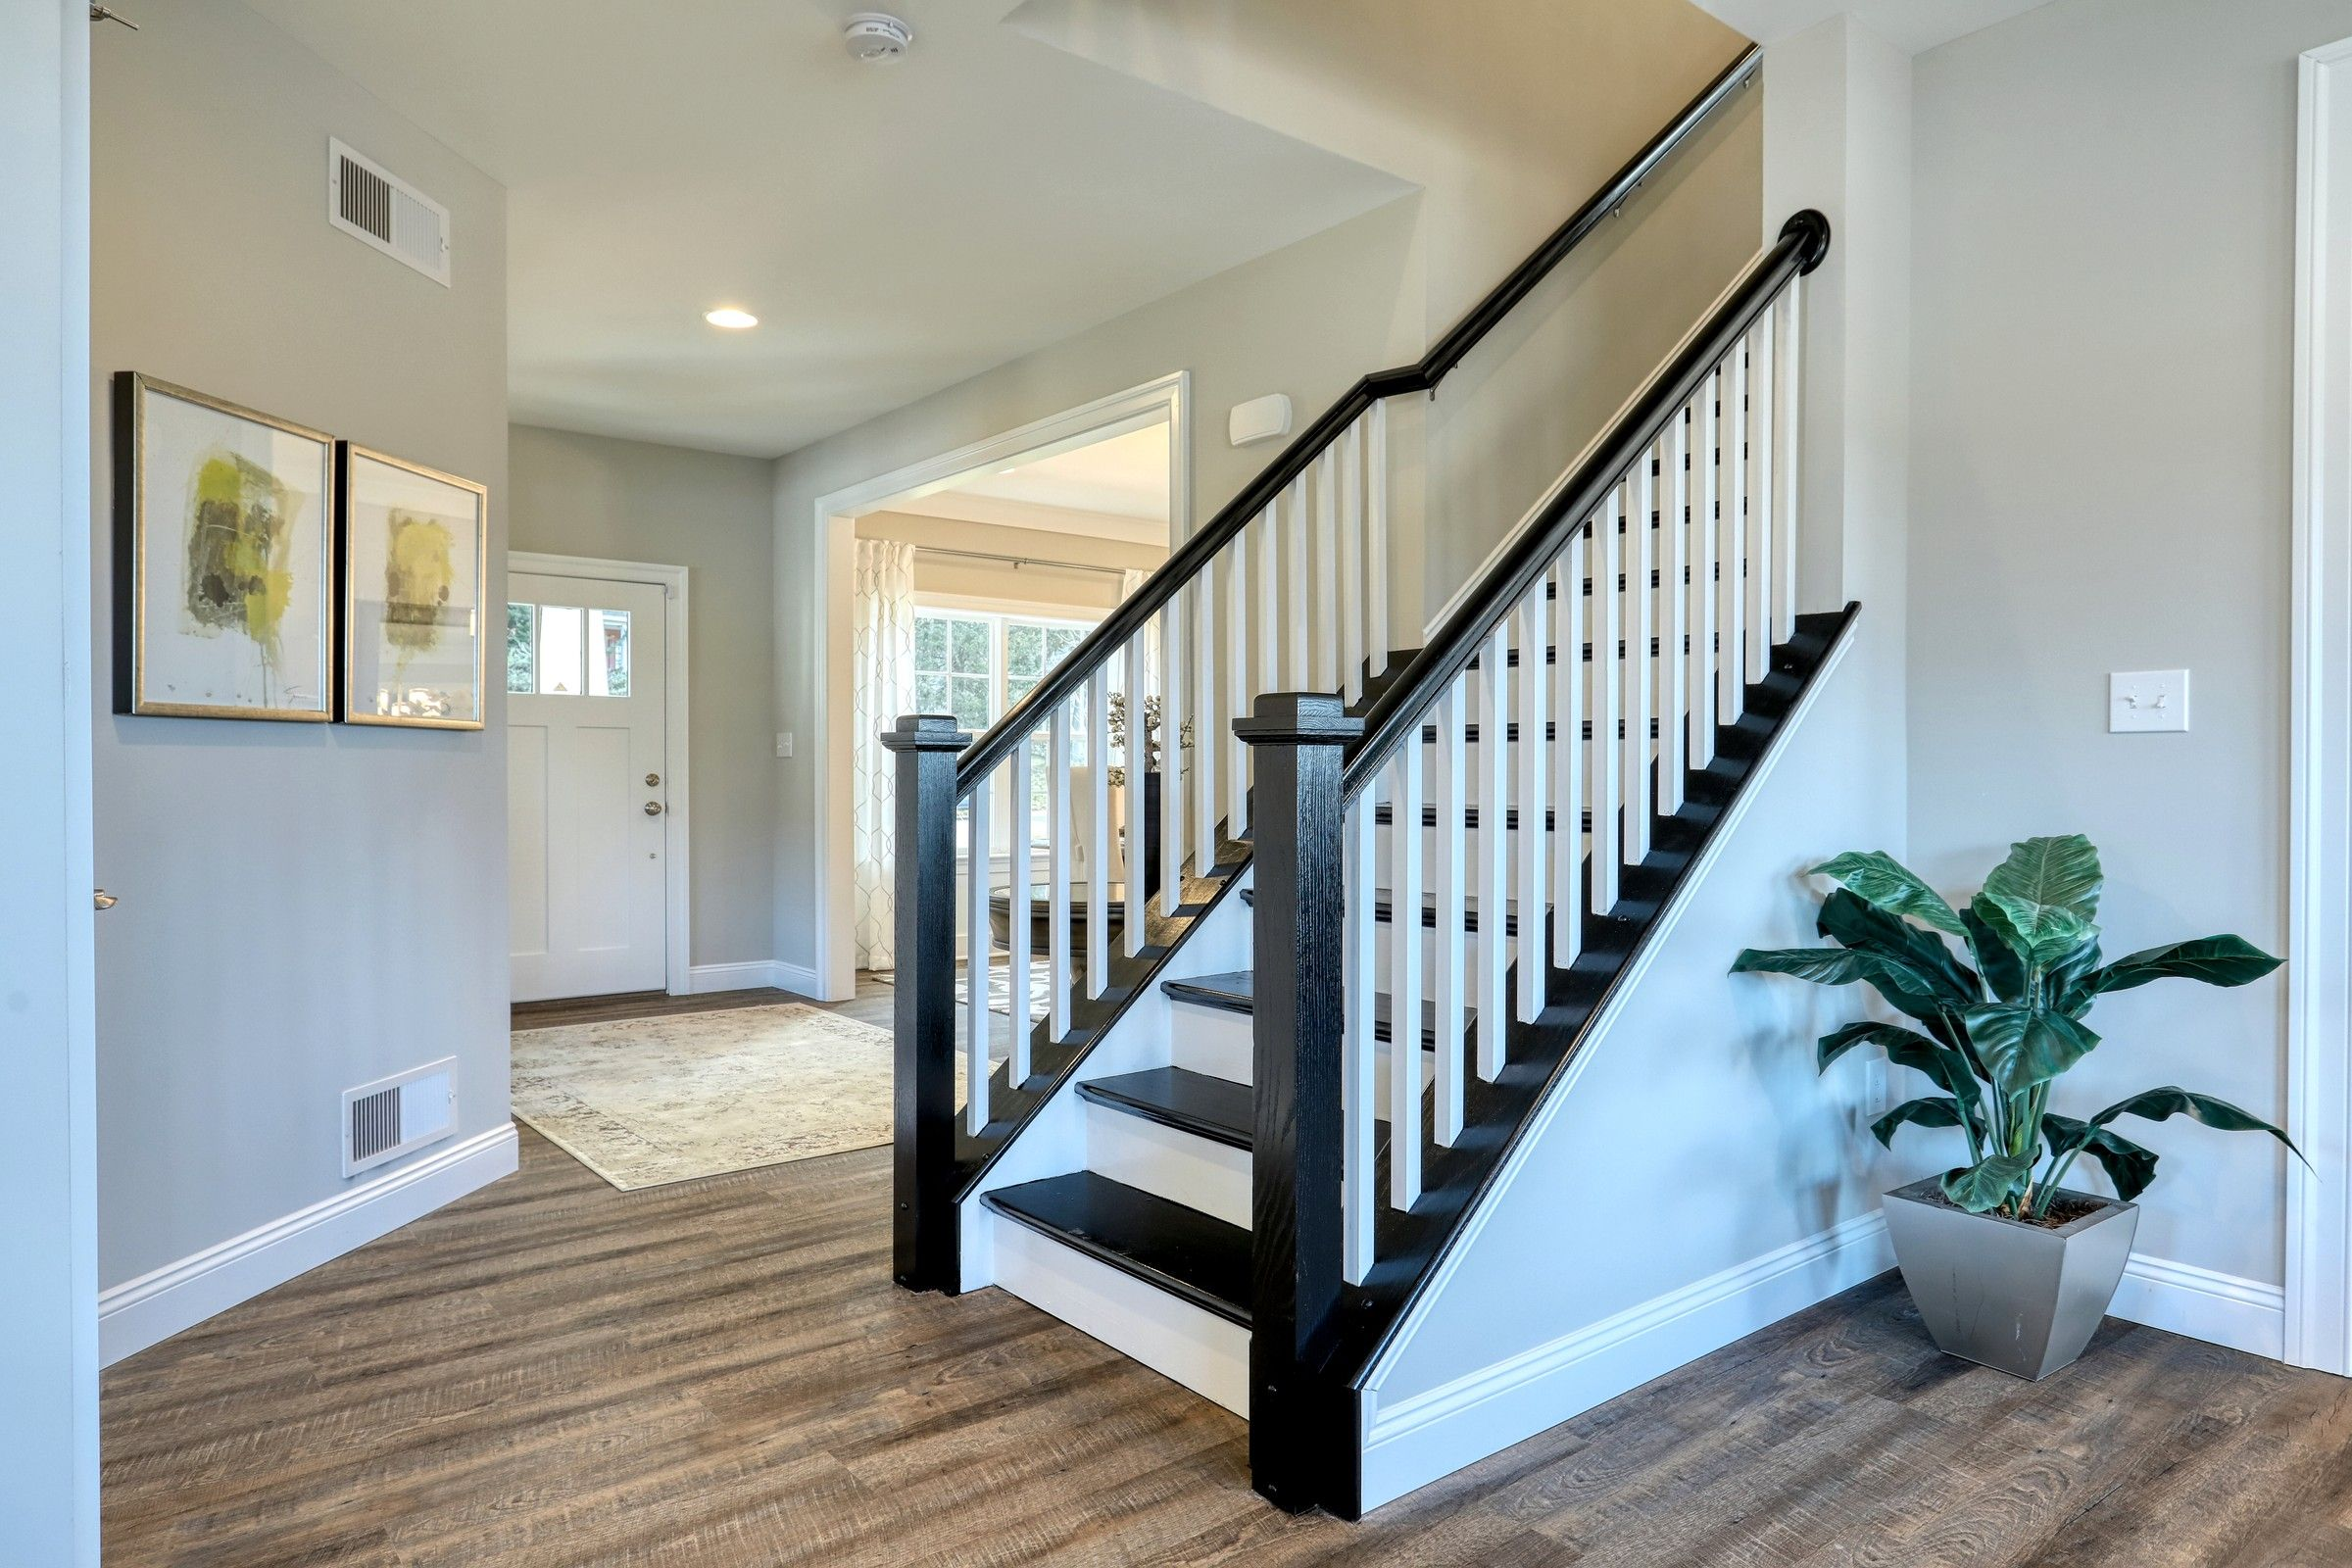 Living Area featured in the Parker Bordeaux By Keystone Custom Homes in Philadelphia, PA